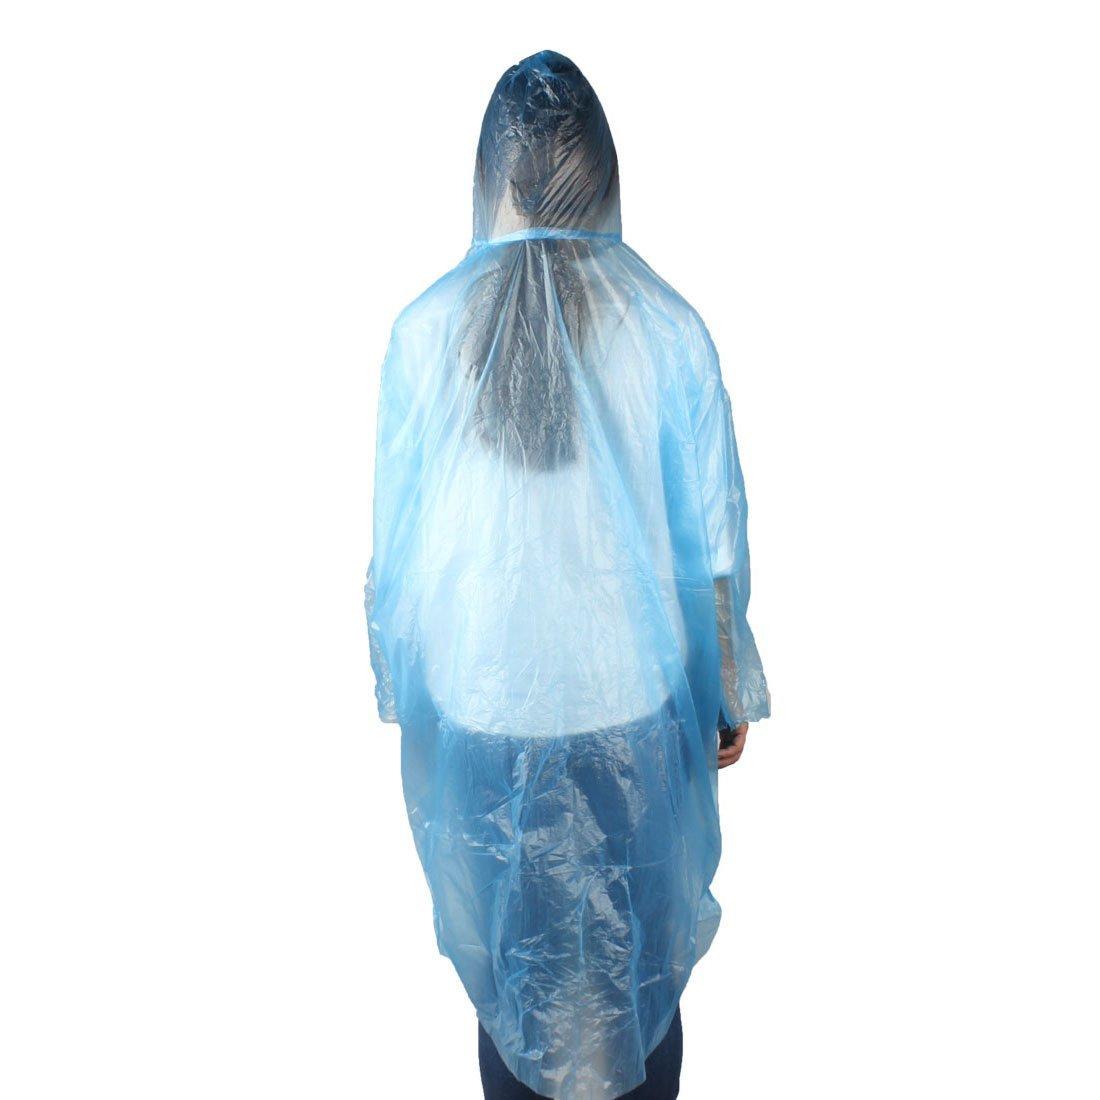 Amazon.com: eDealMax plástico PVC desechables Para adultos ...